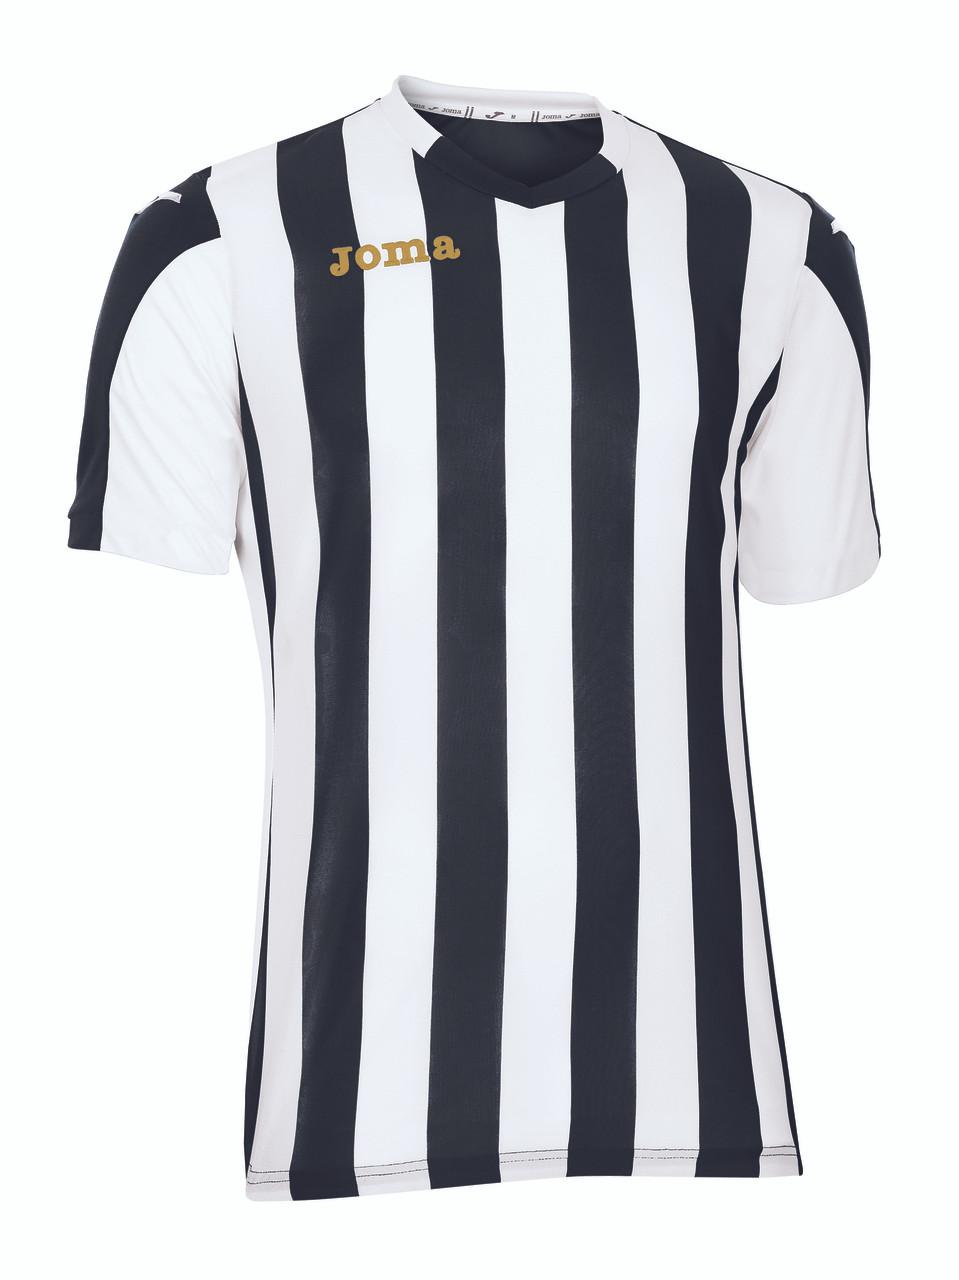 ca253b33af00 Joma Copa Shirt Short Sleeved - Galaxyfootball